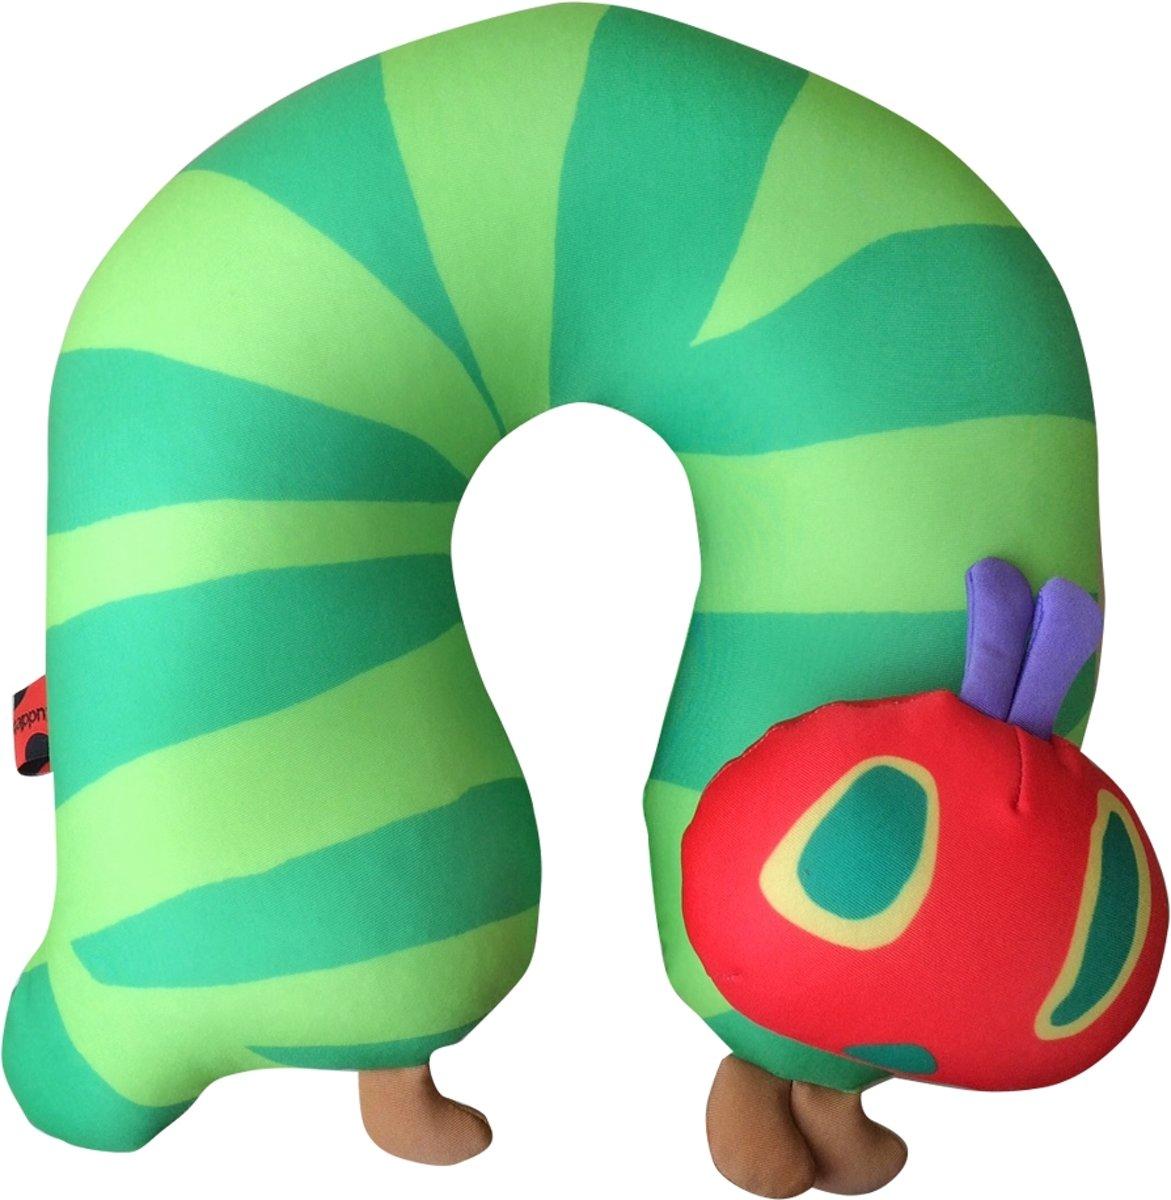 Cuddlebug Rups kussen kopen